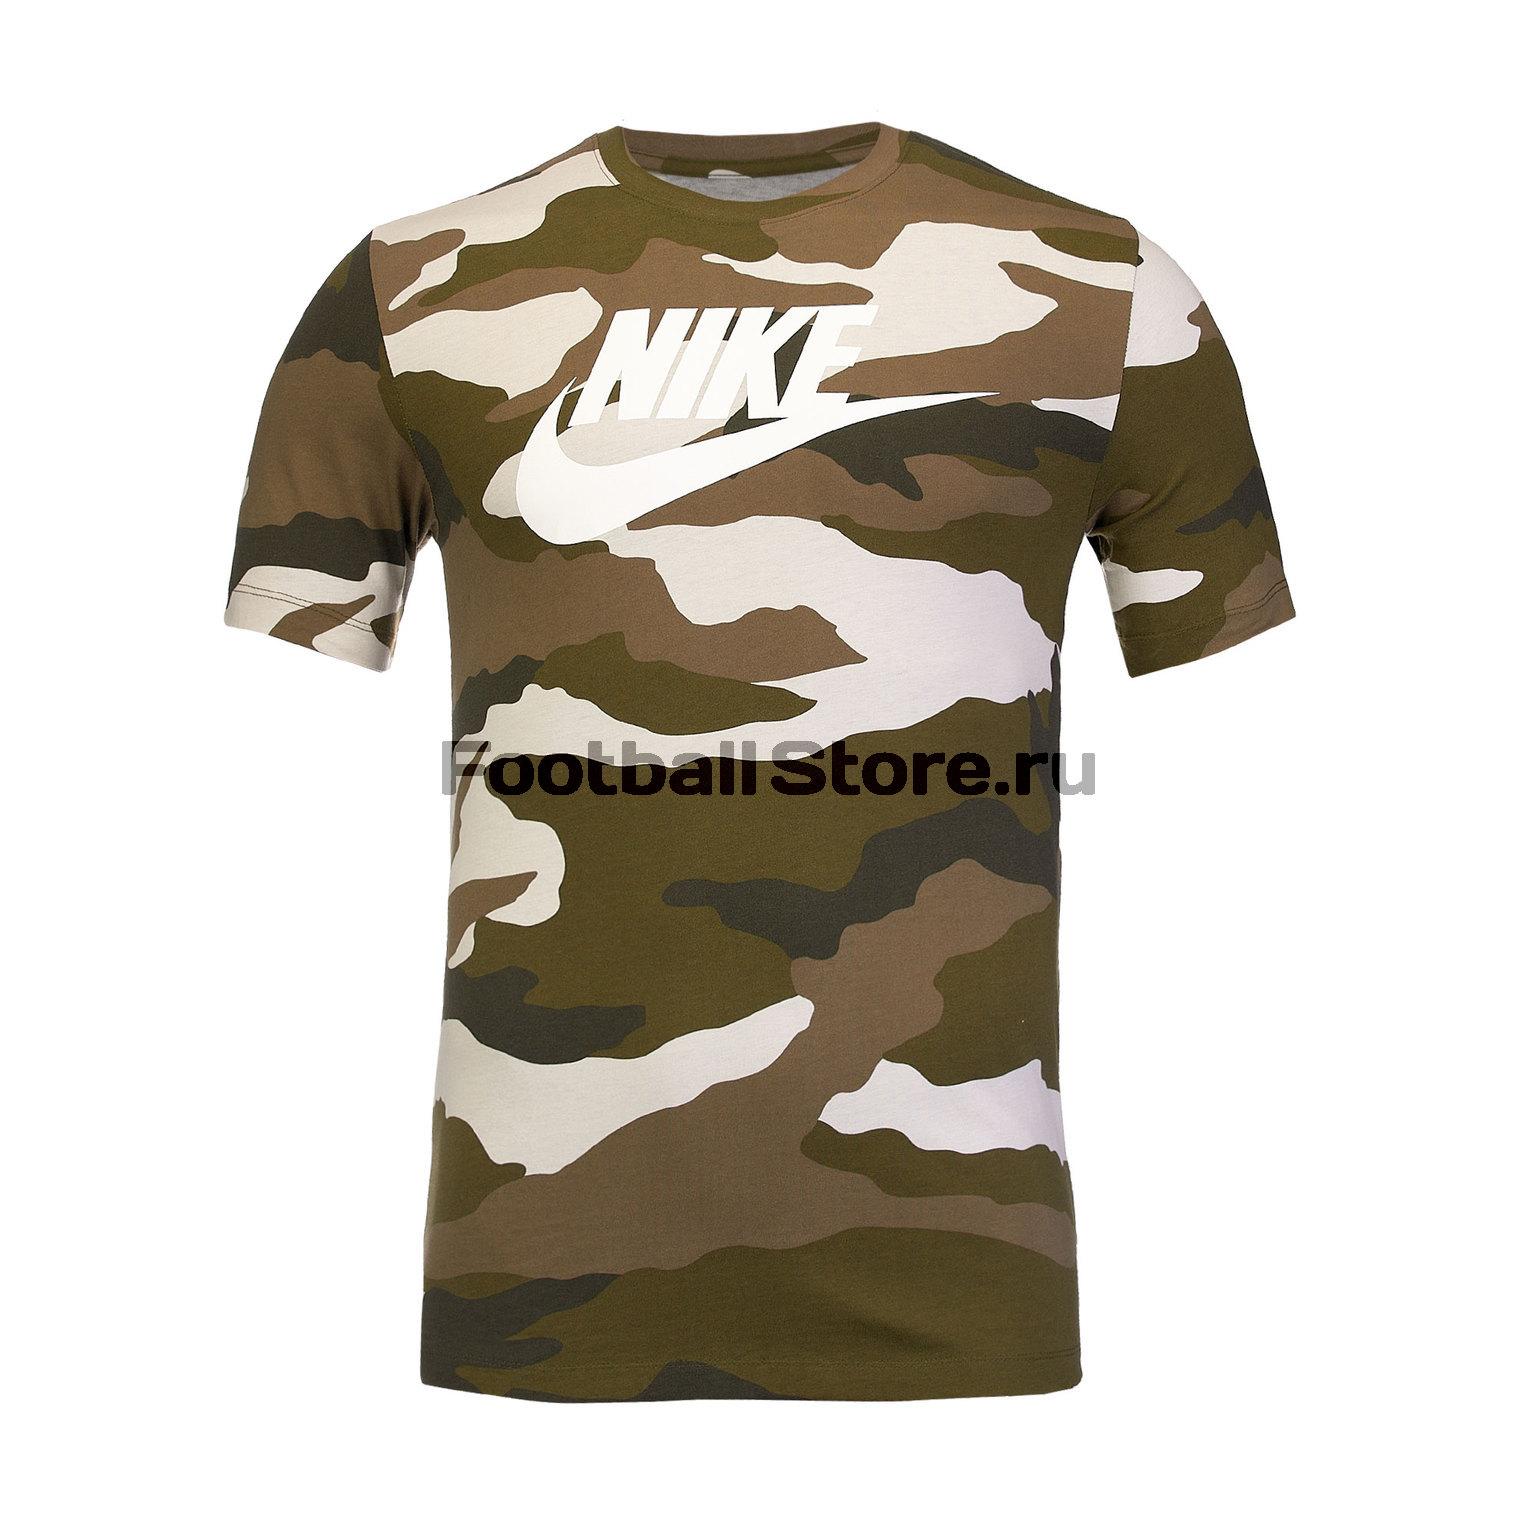 Футболка хлопковая Nike Tee Camo BV7674-072 футболка хлопковая nike tee club19 ss aj1504 451